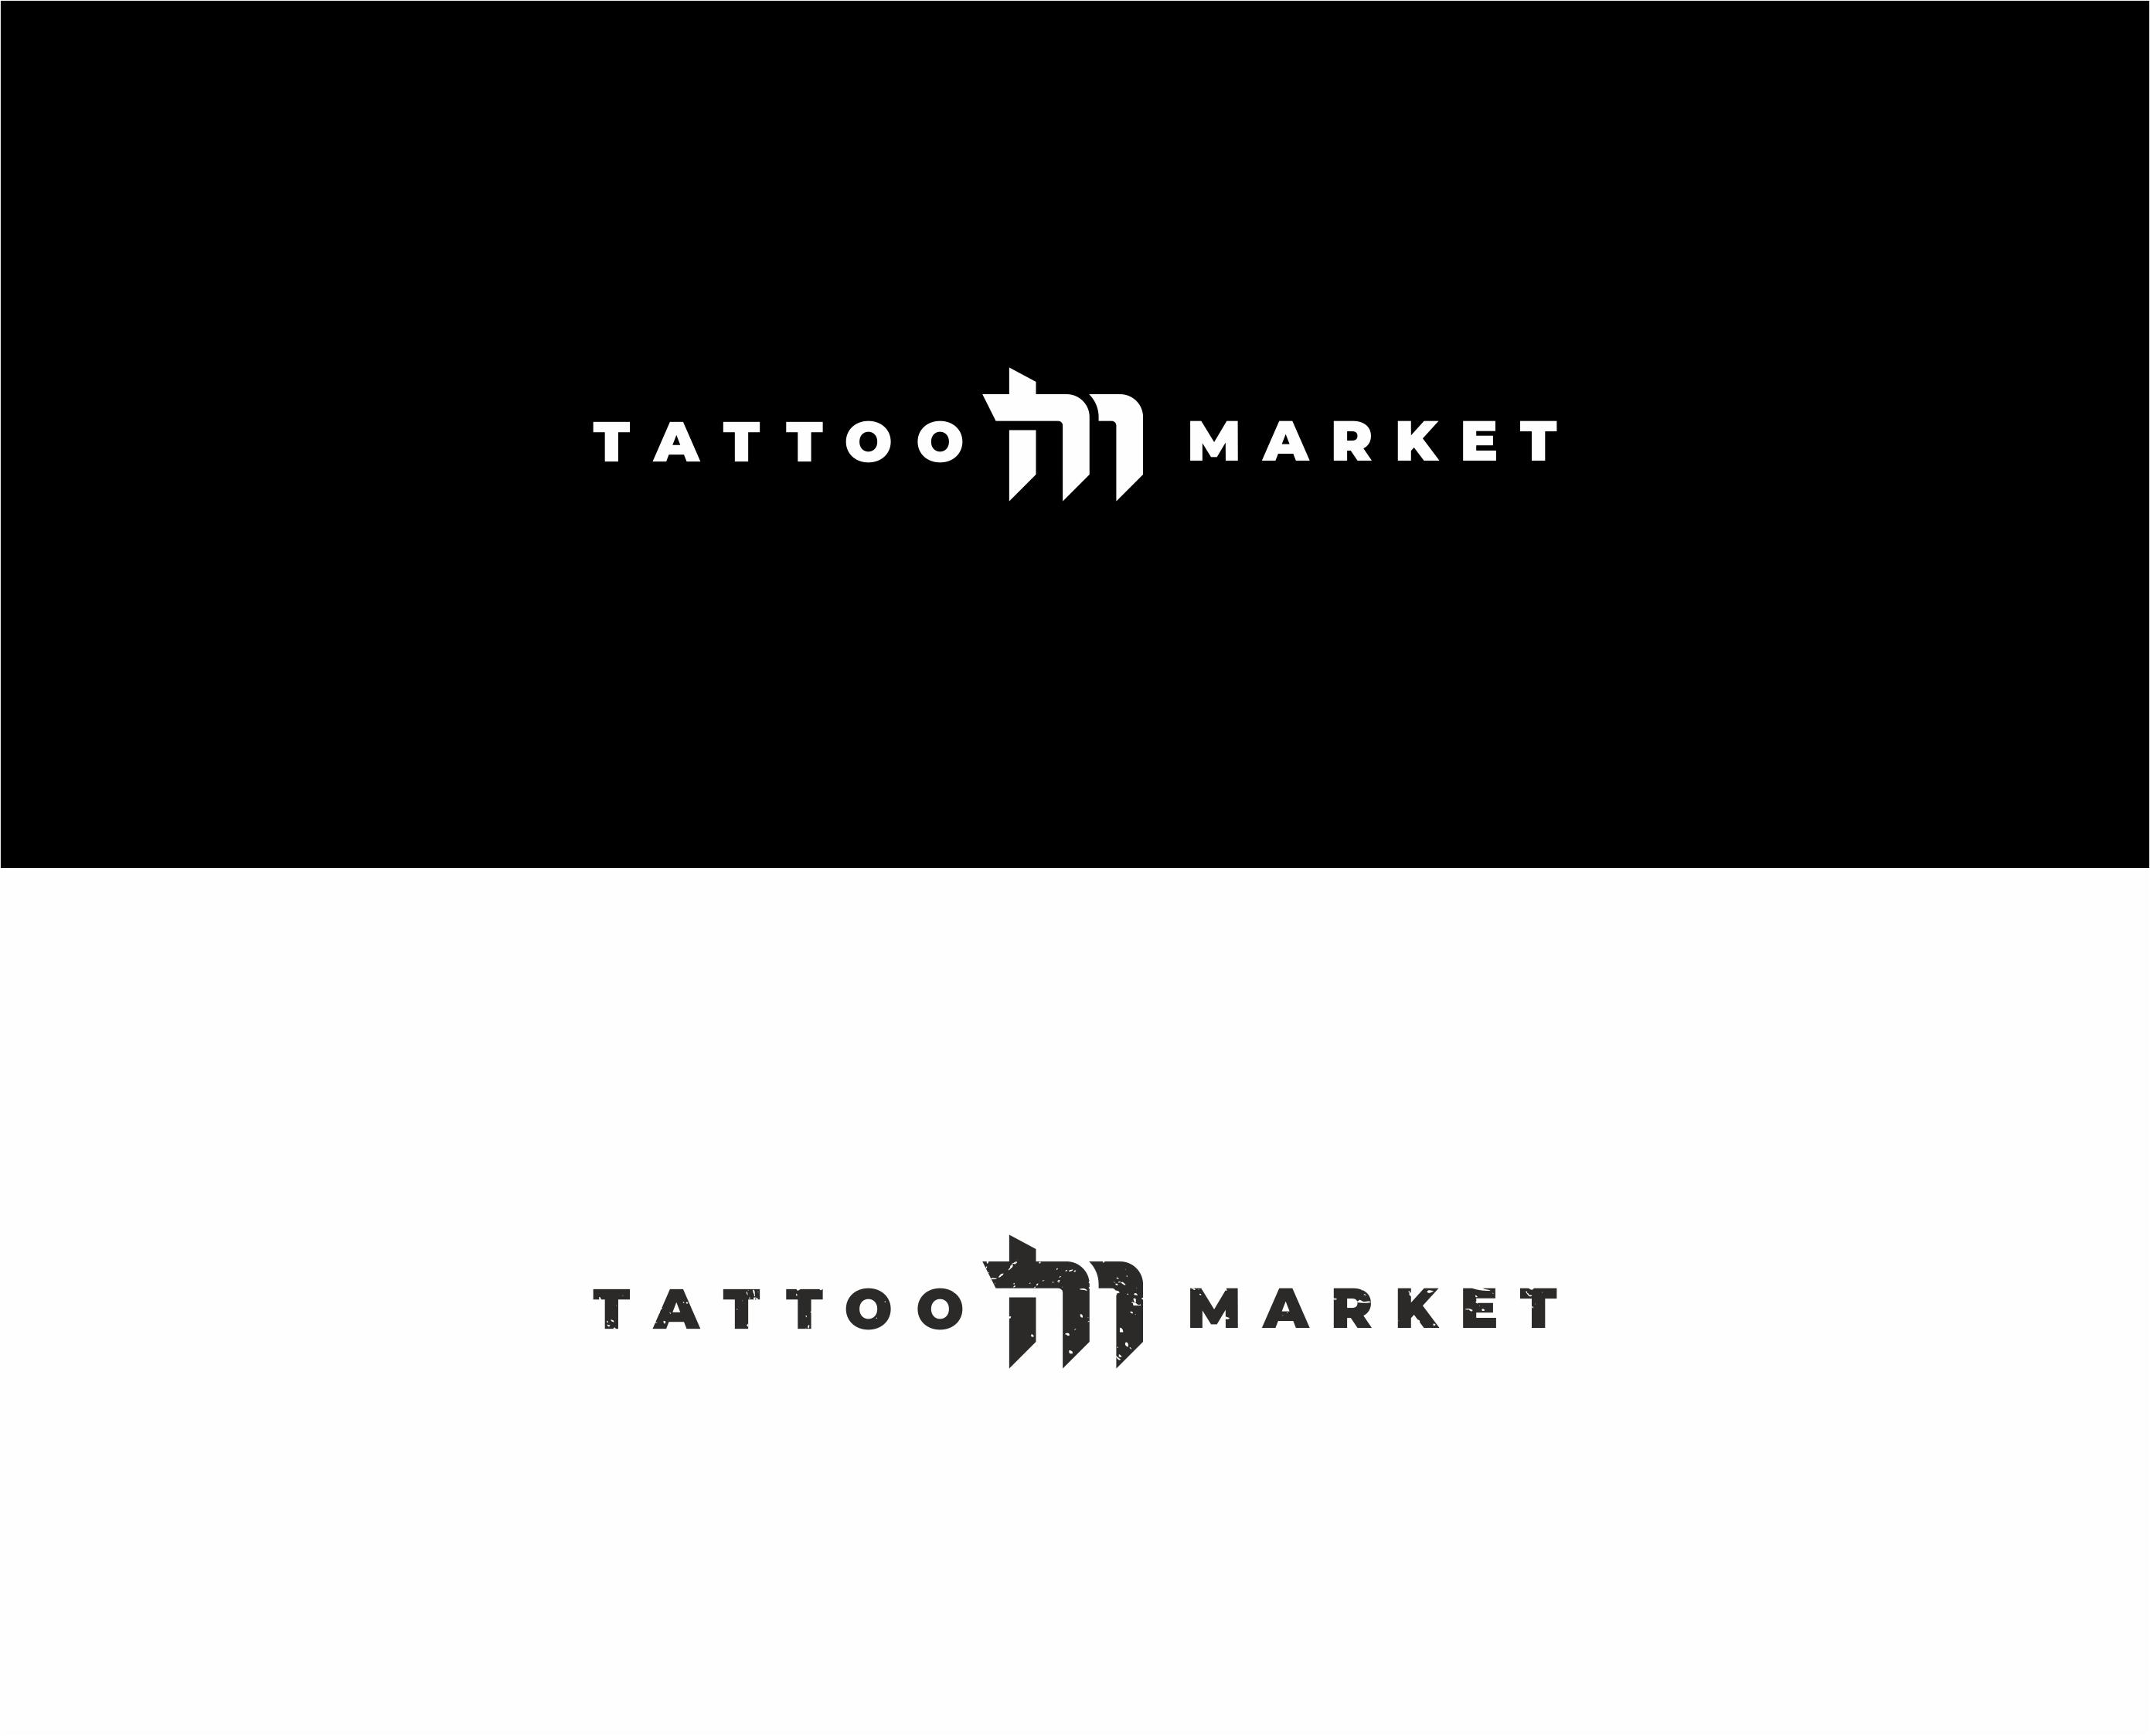 Редизайн логотипа магазина тату оборудования TattooMarket.ru фото f_4935c3ee9197d005.jpg